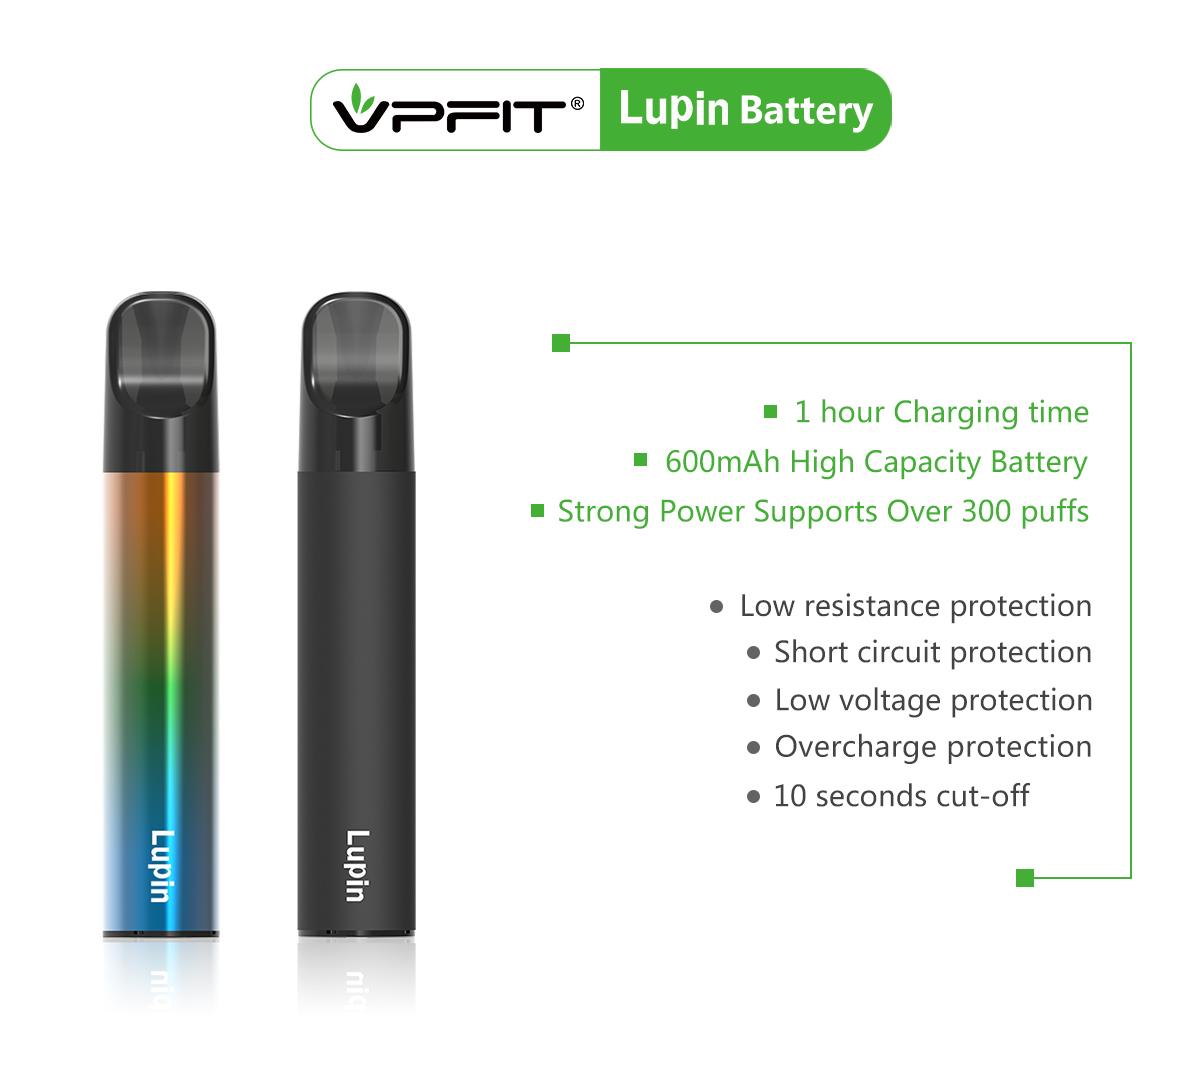 600mAh batter of Lupin